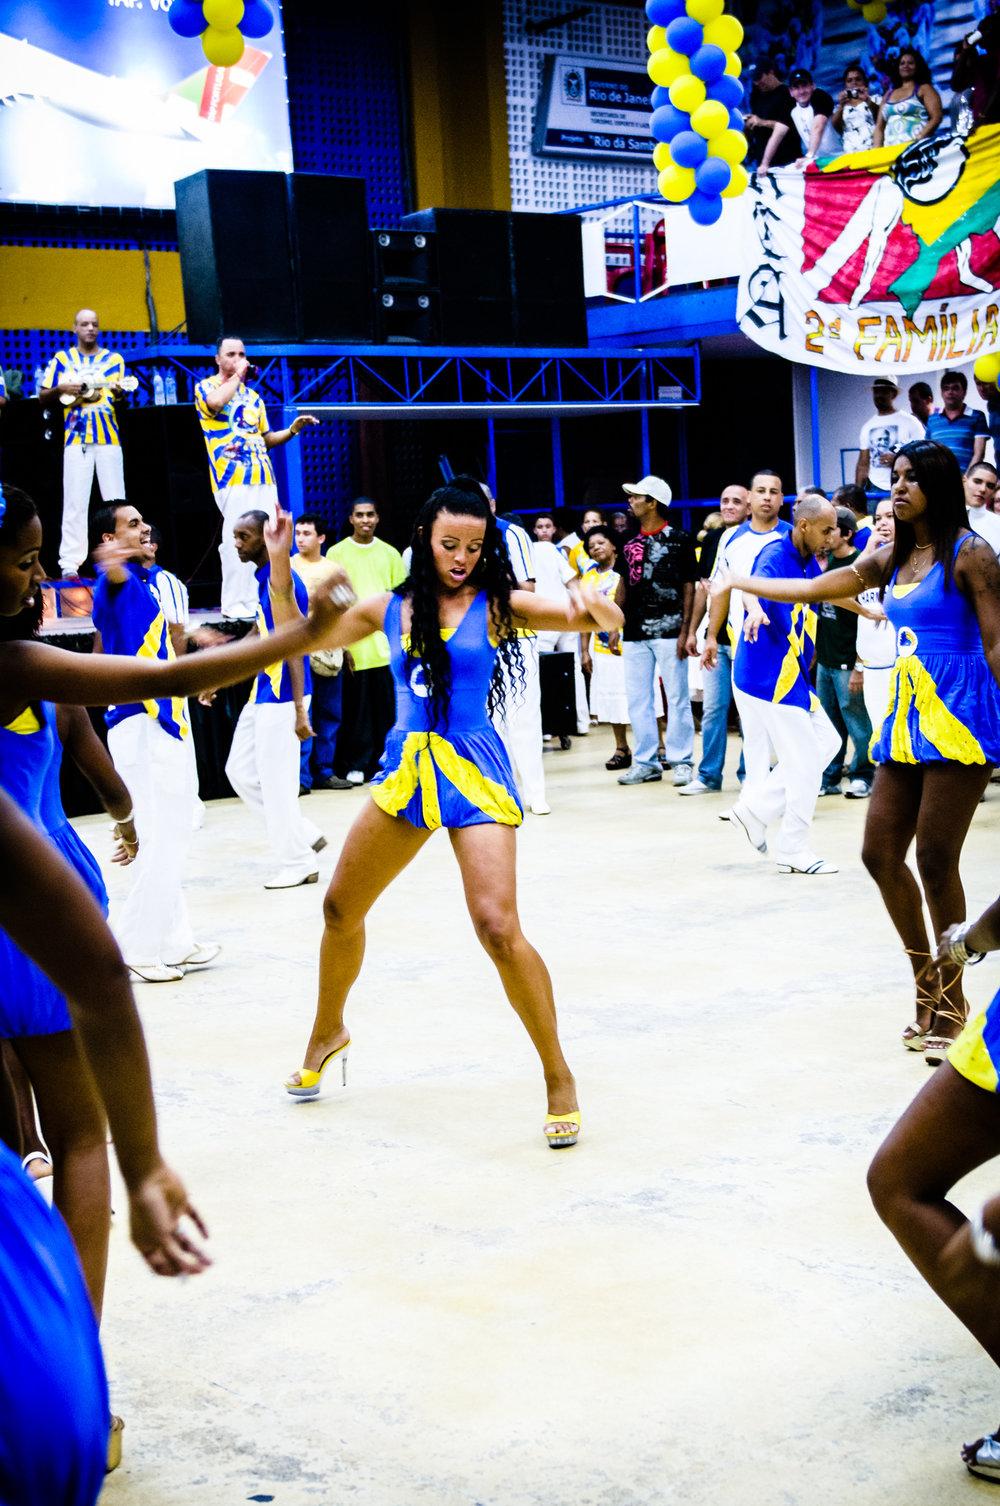 Scott_Myers__Brazil_Samba-5426.jpg